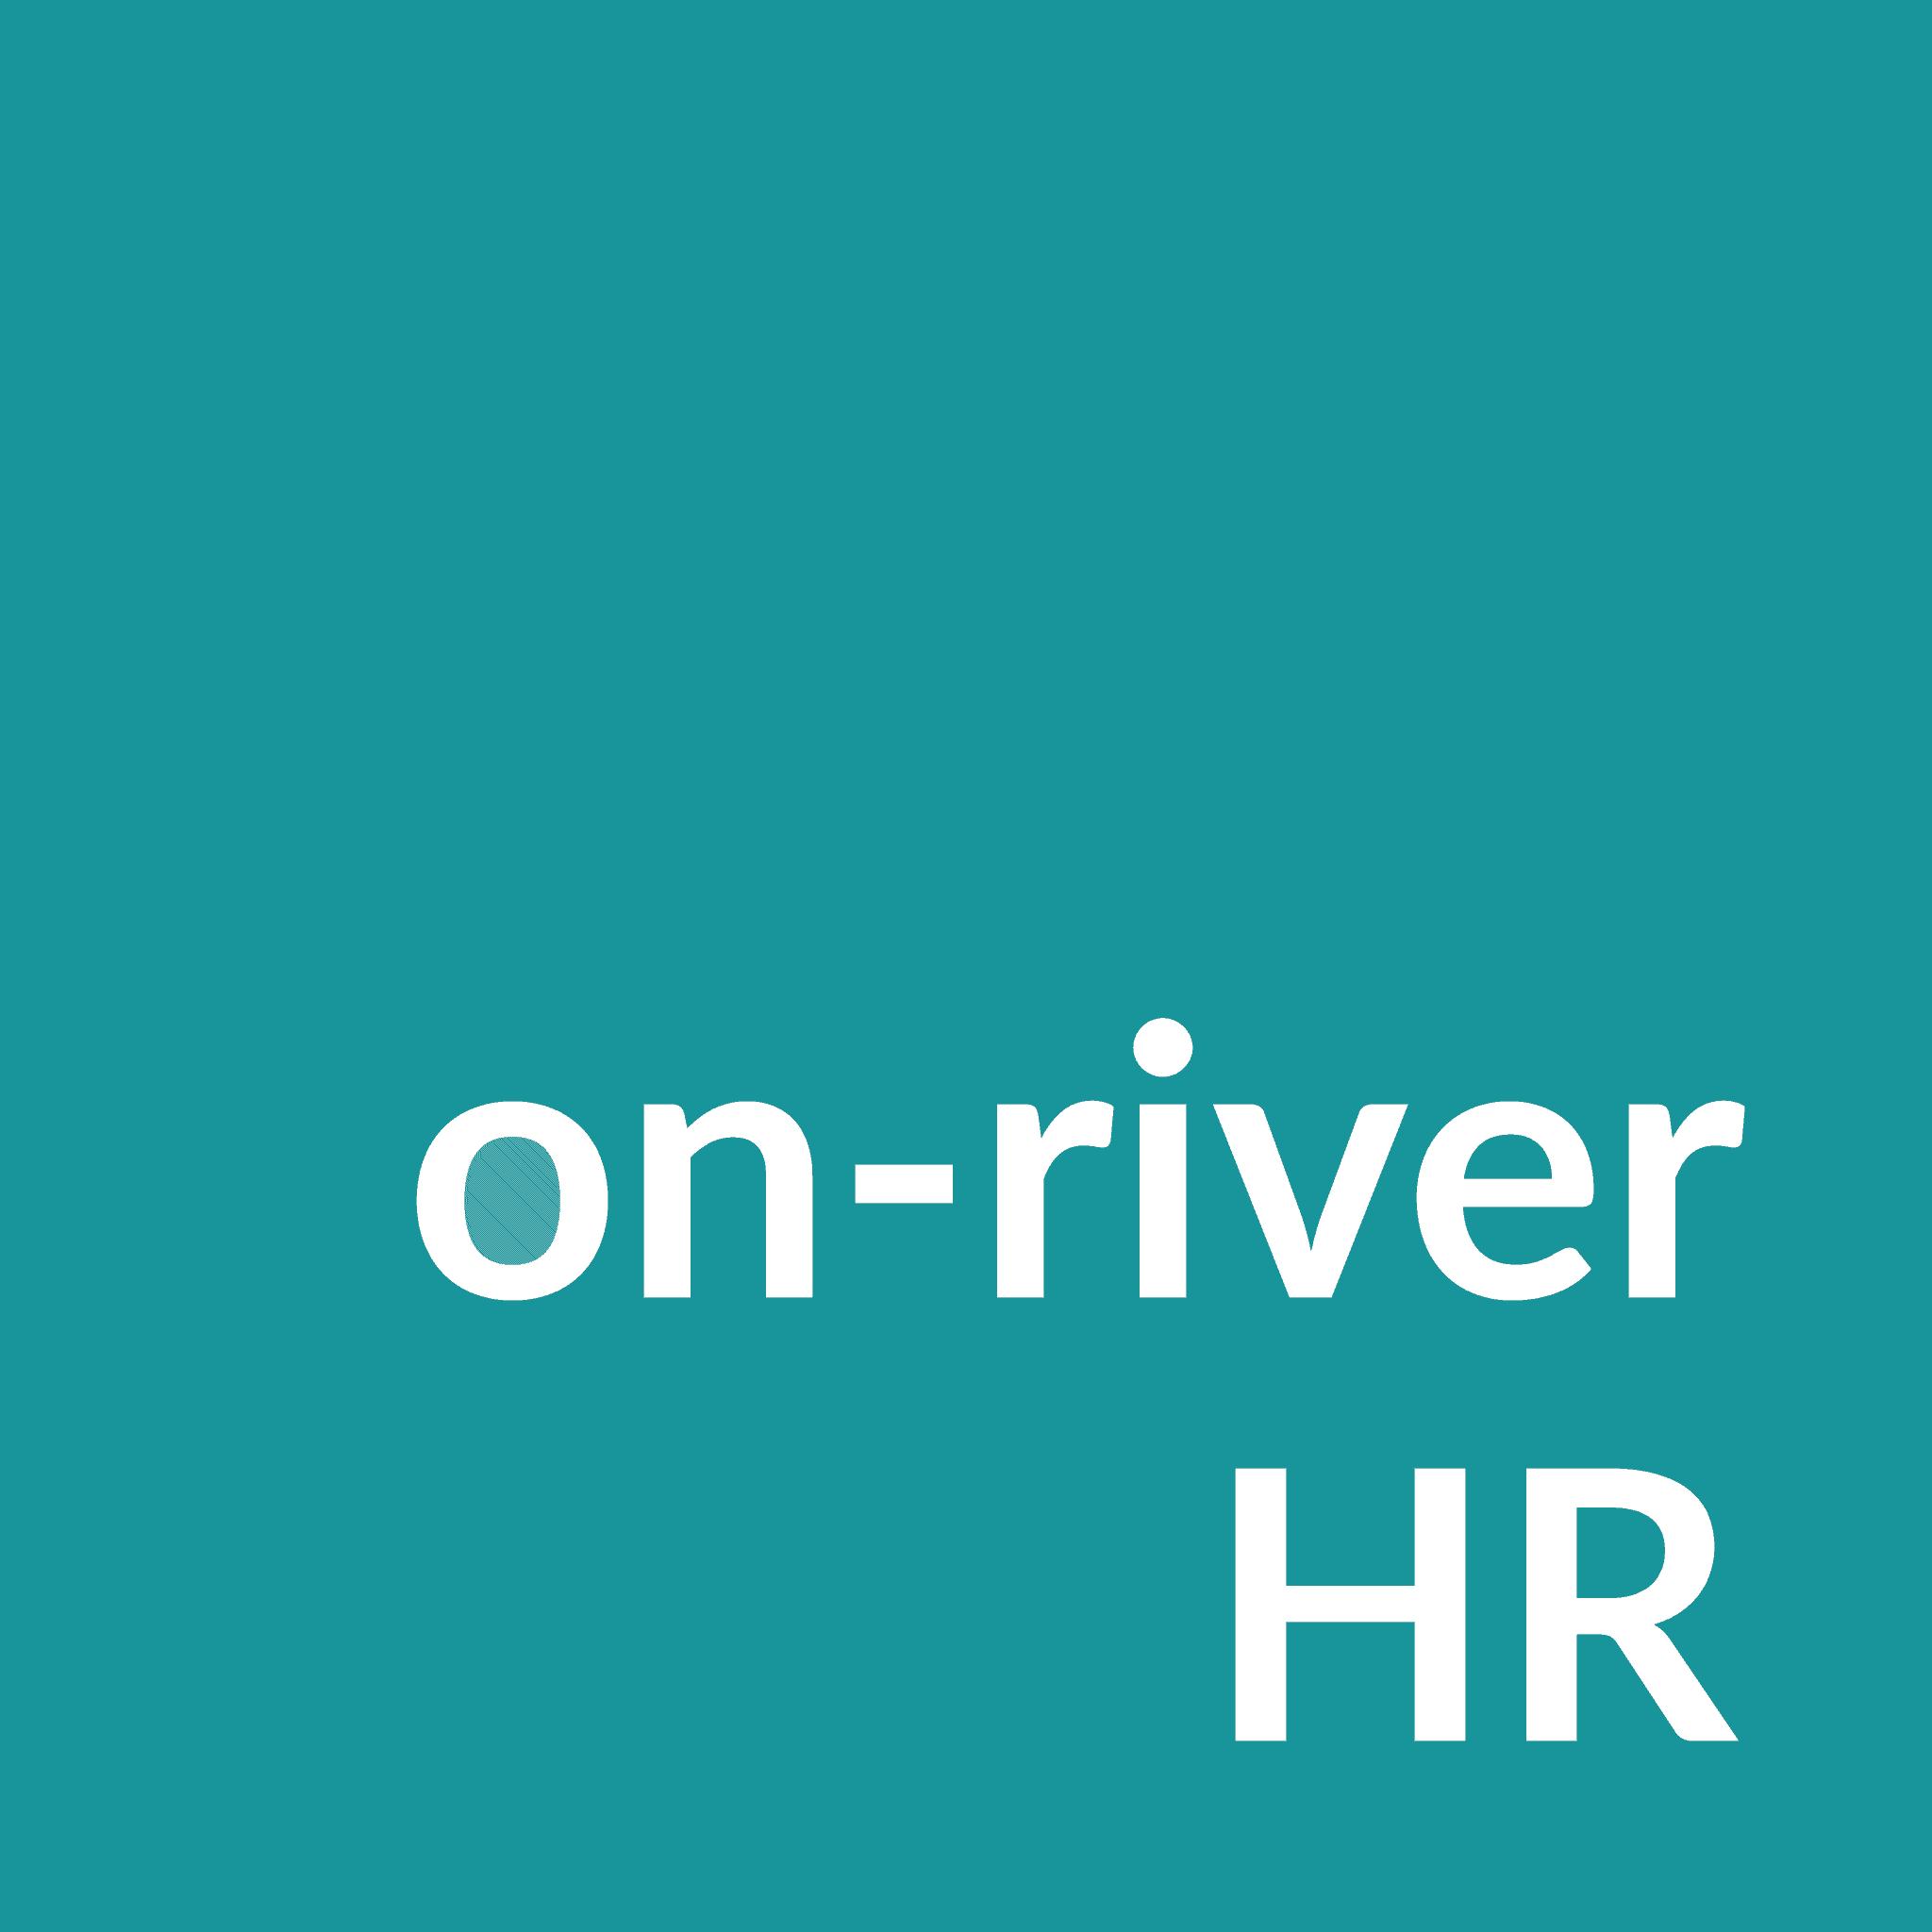 On-River HR